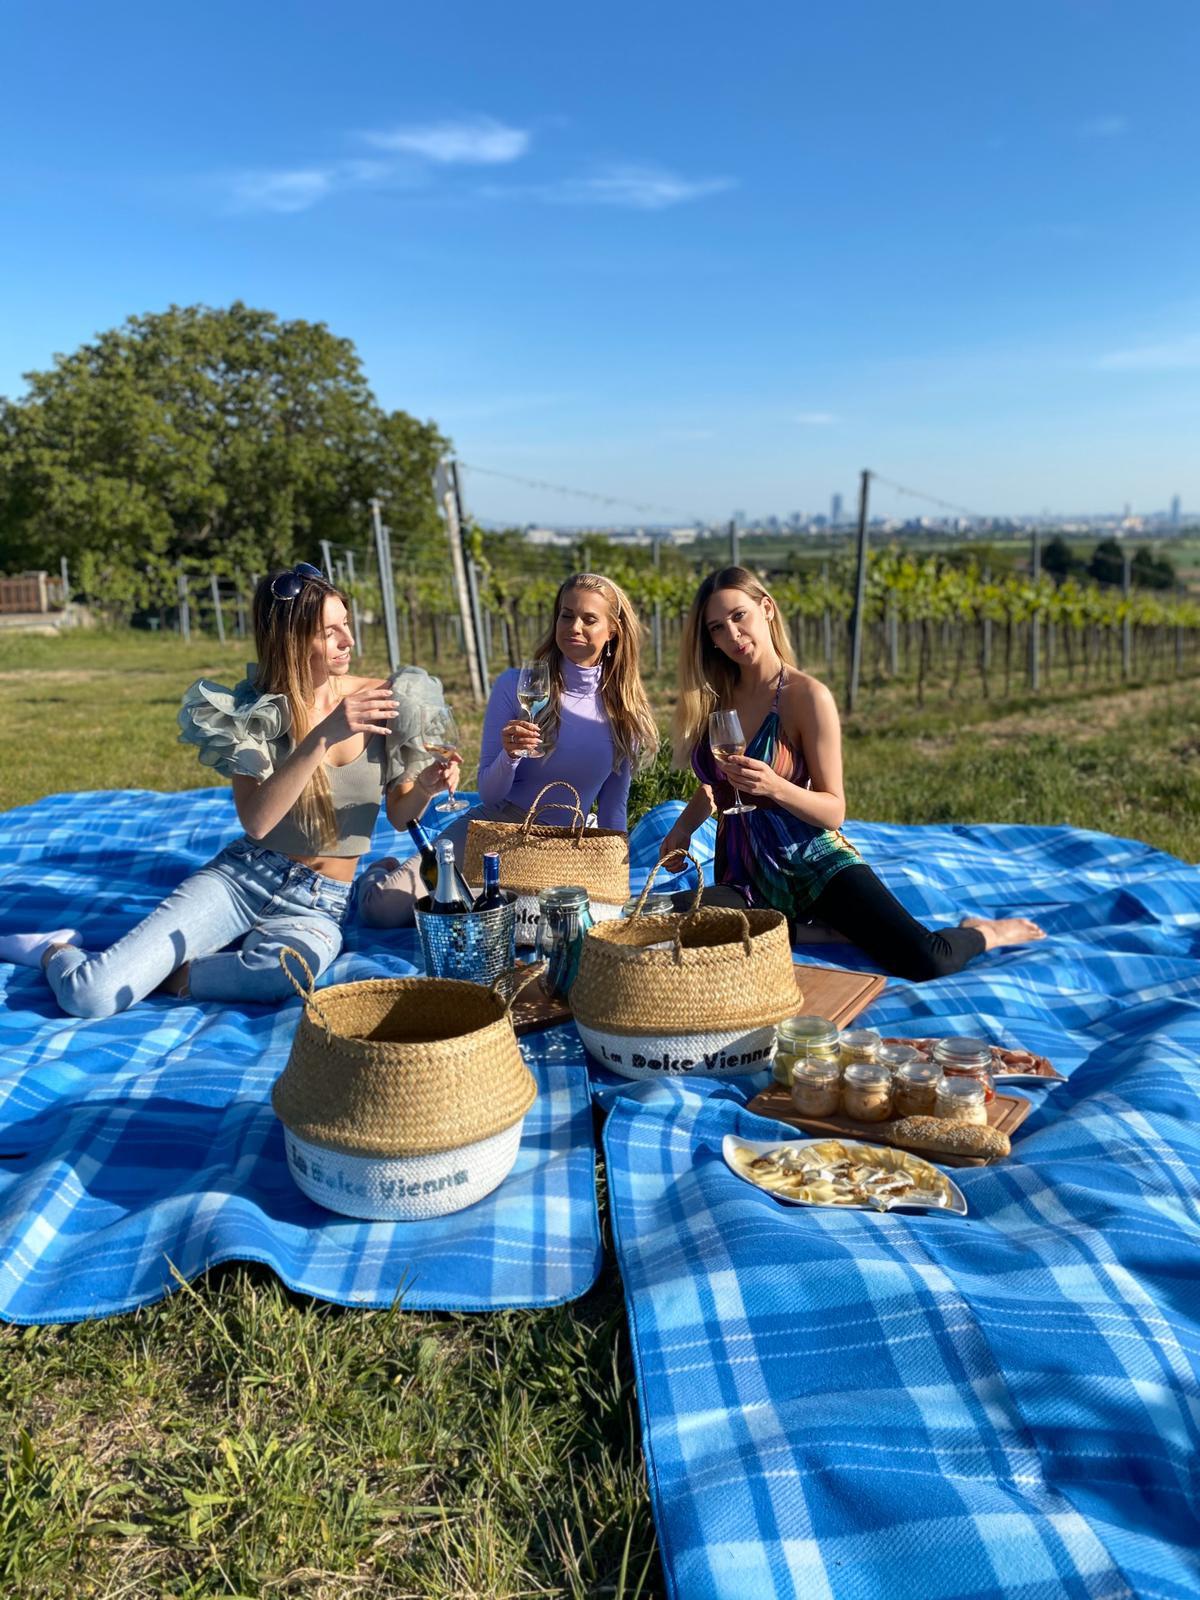 Wein Picknick